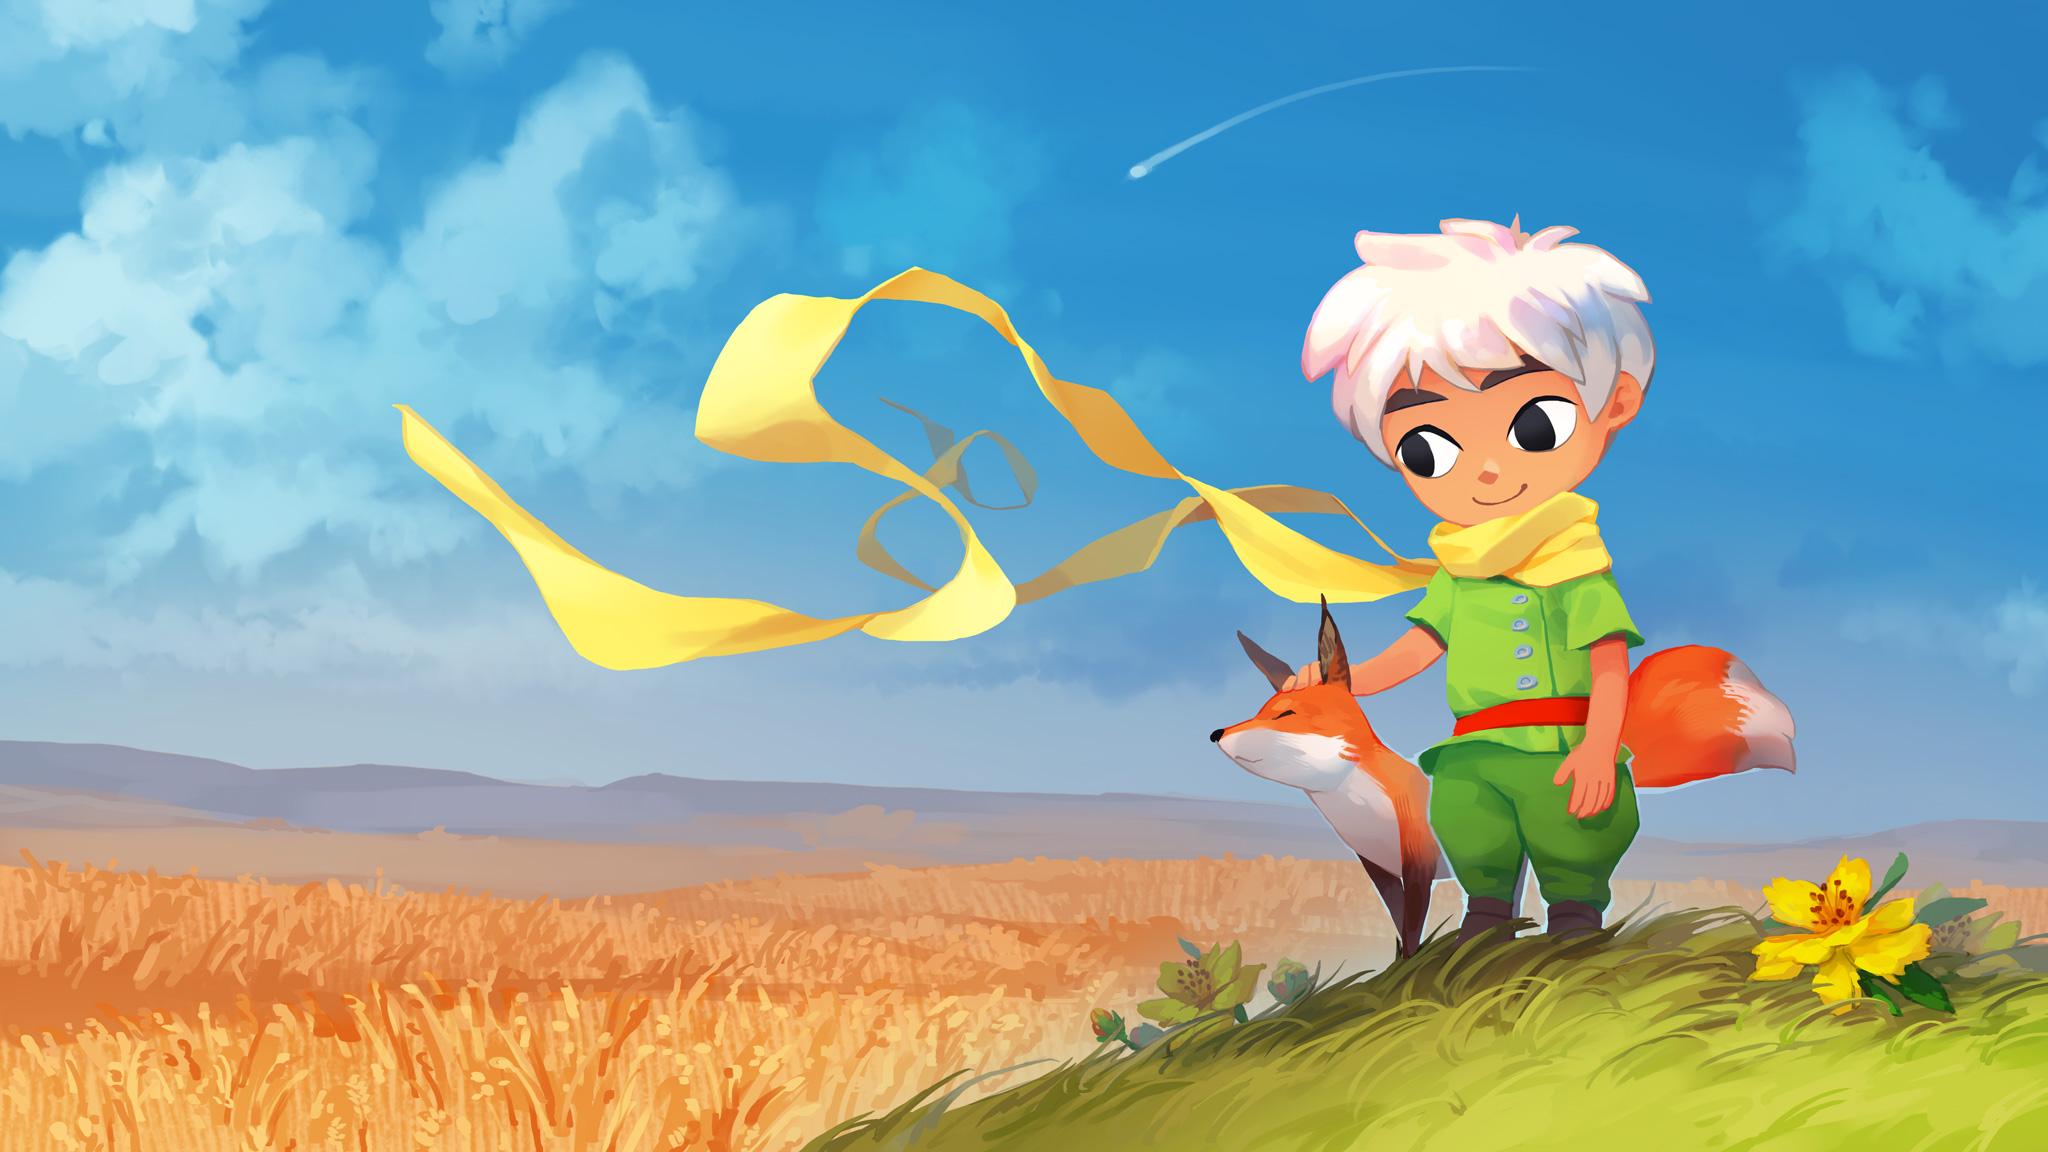 The Wheat Fields by nikogeyer